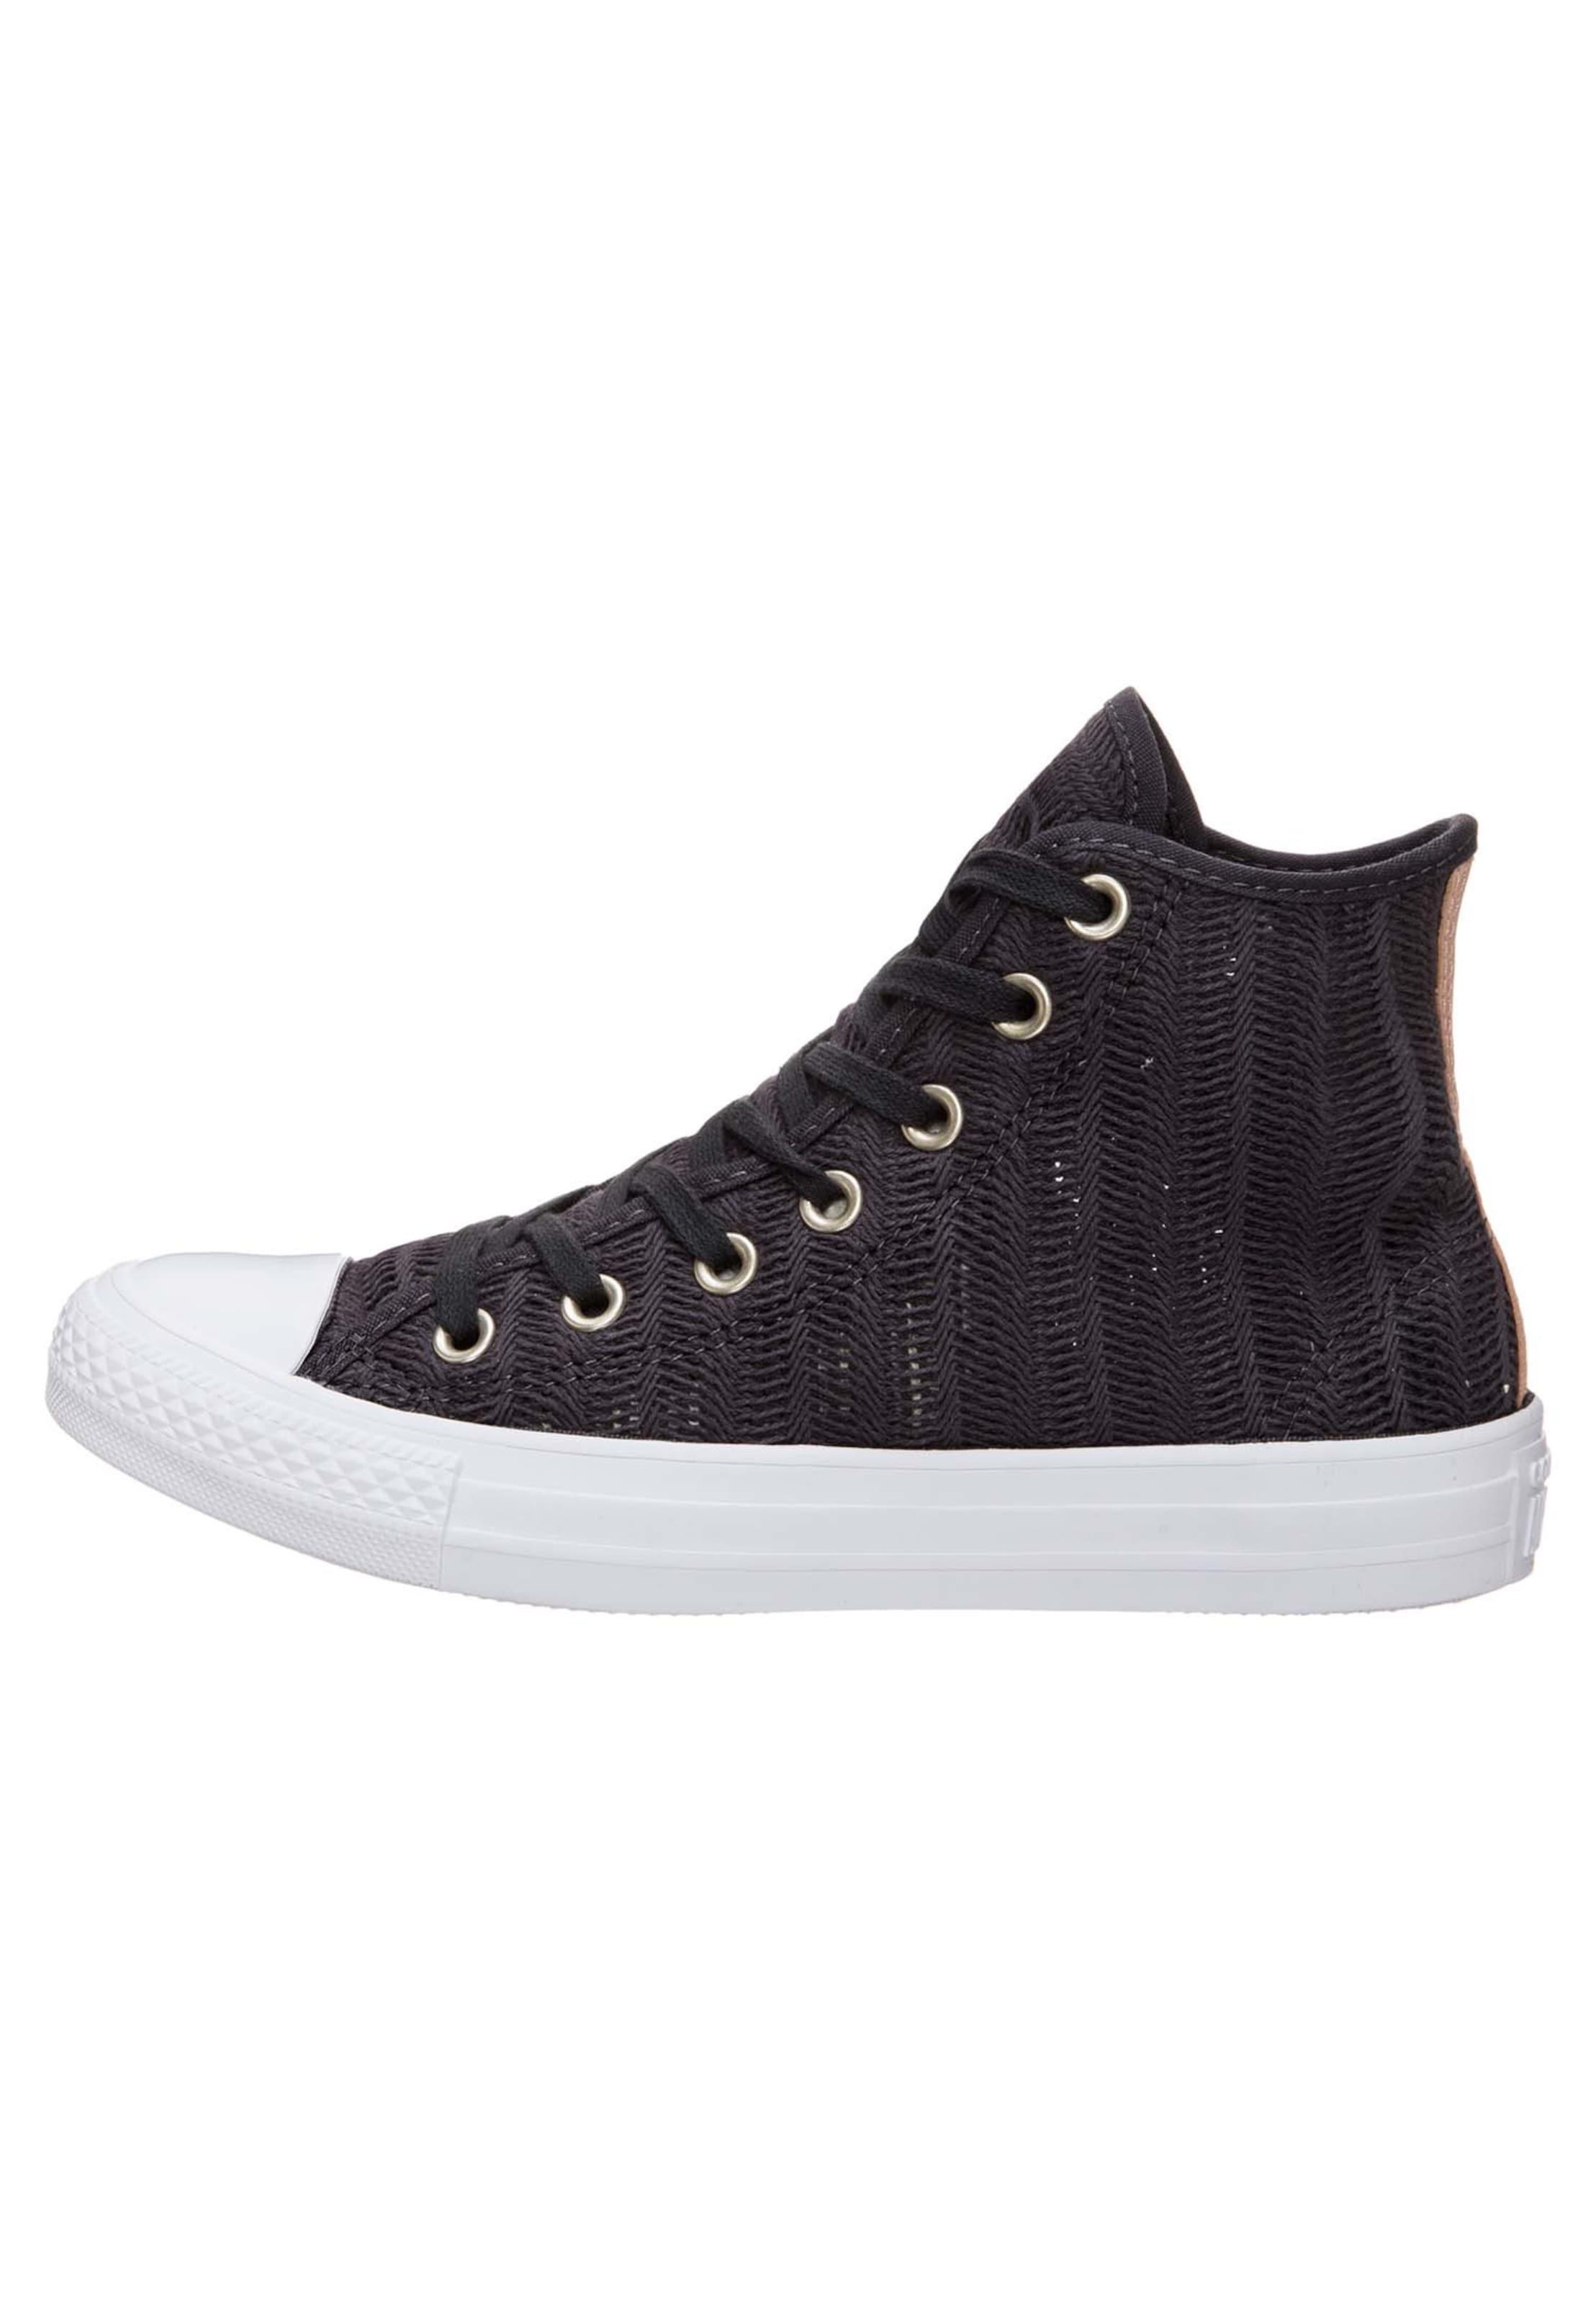 Herringbone CremeDunkelgrau Sneaker In 'chuck Mesh' Star Converse High Schwarz Taylor All mnO8vN0w